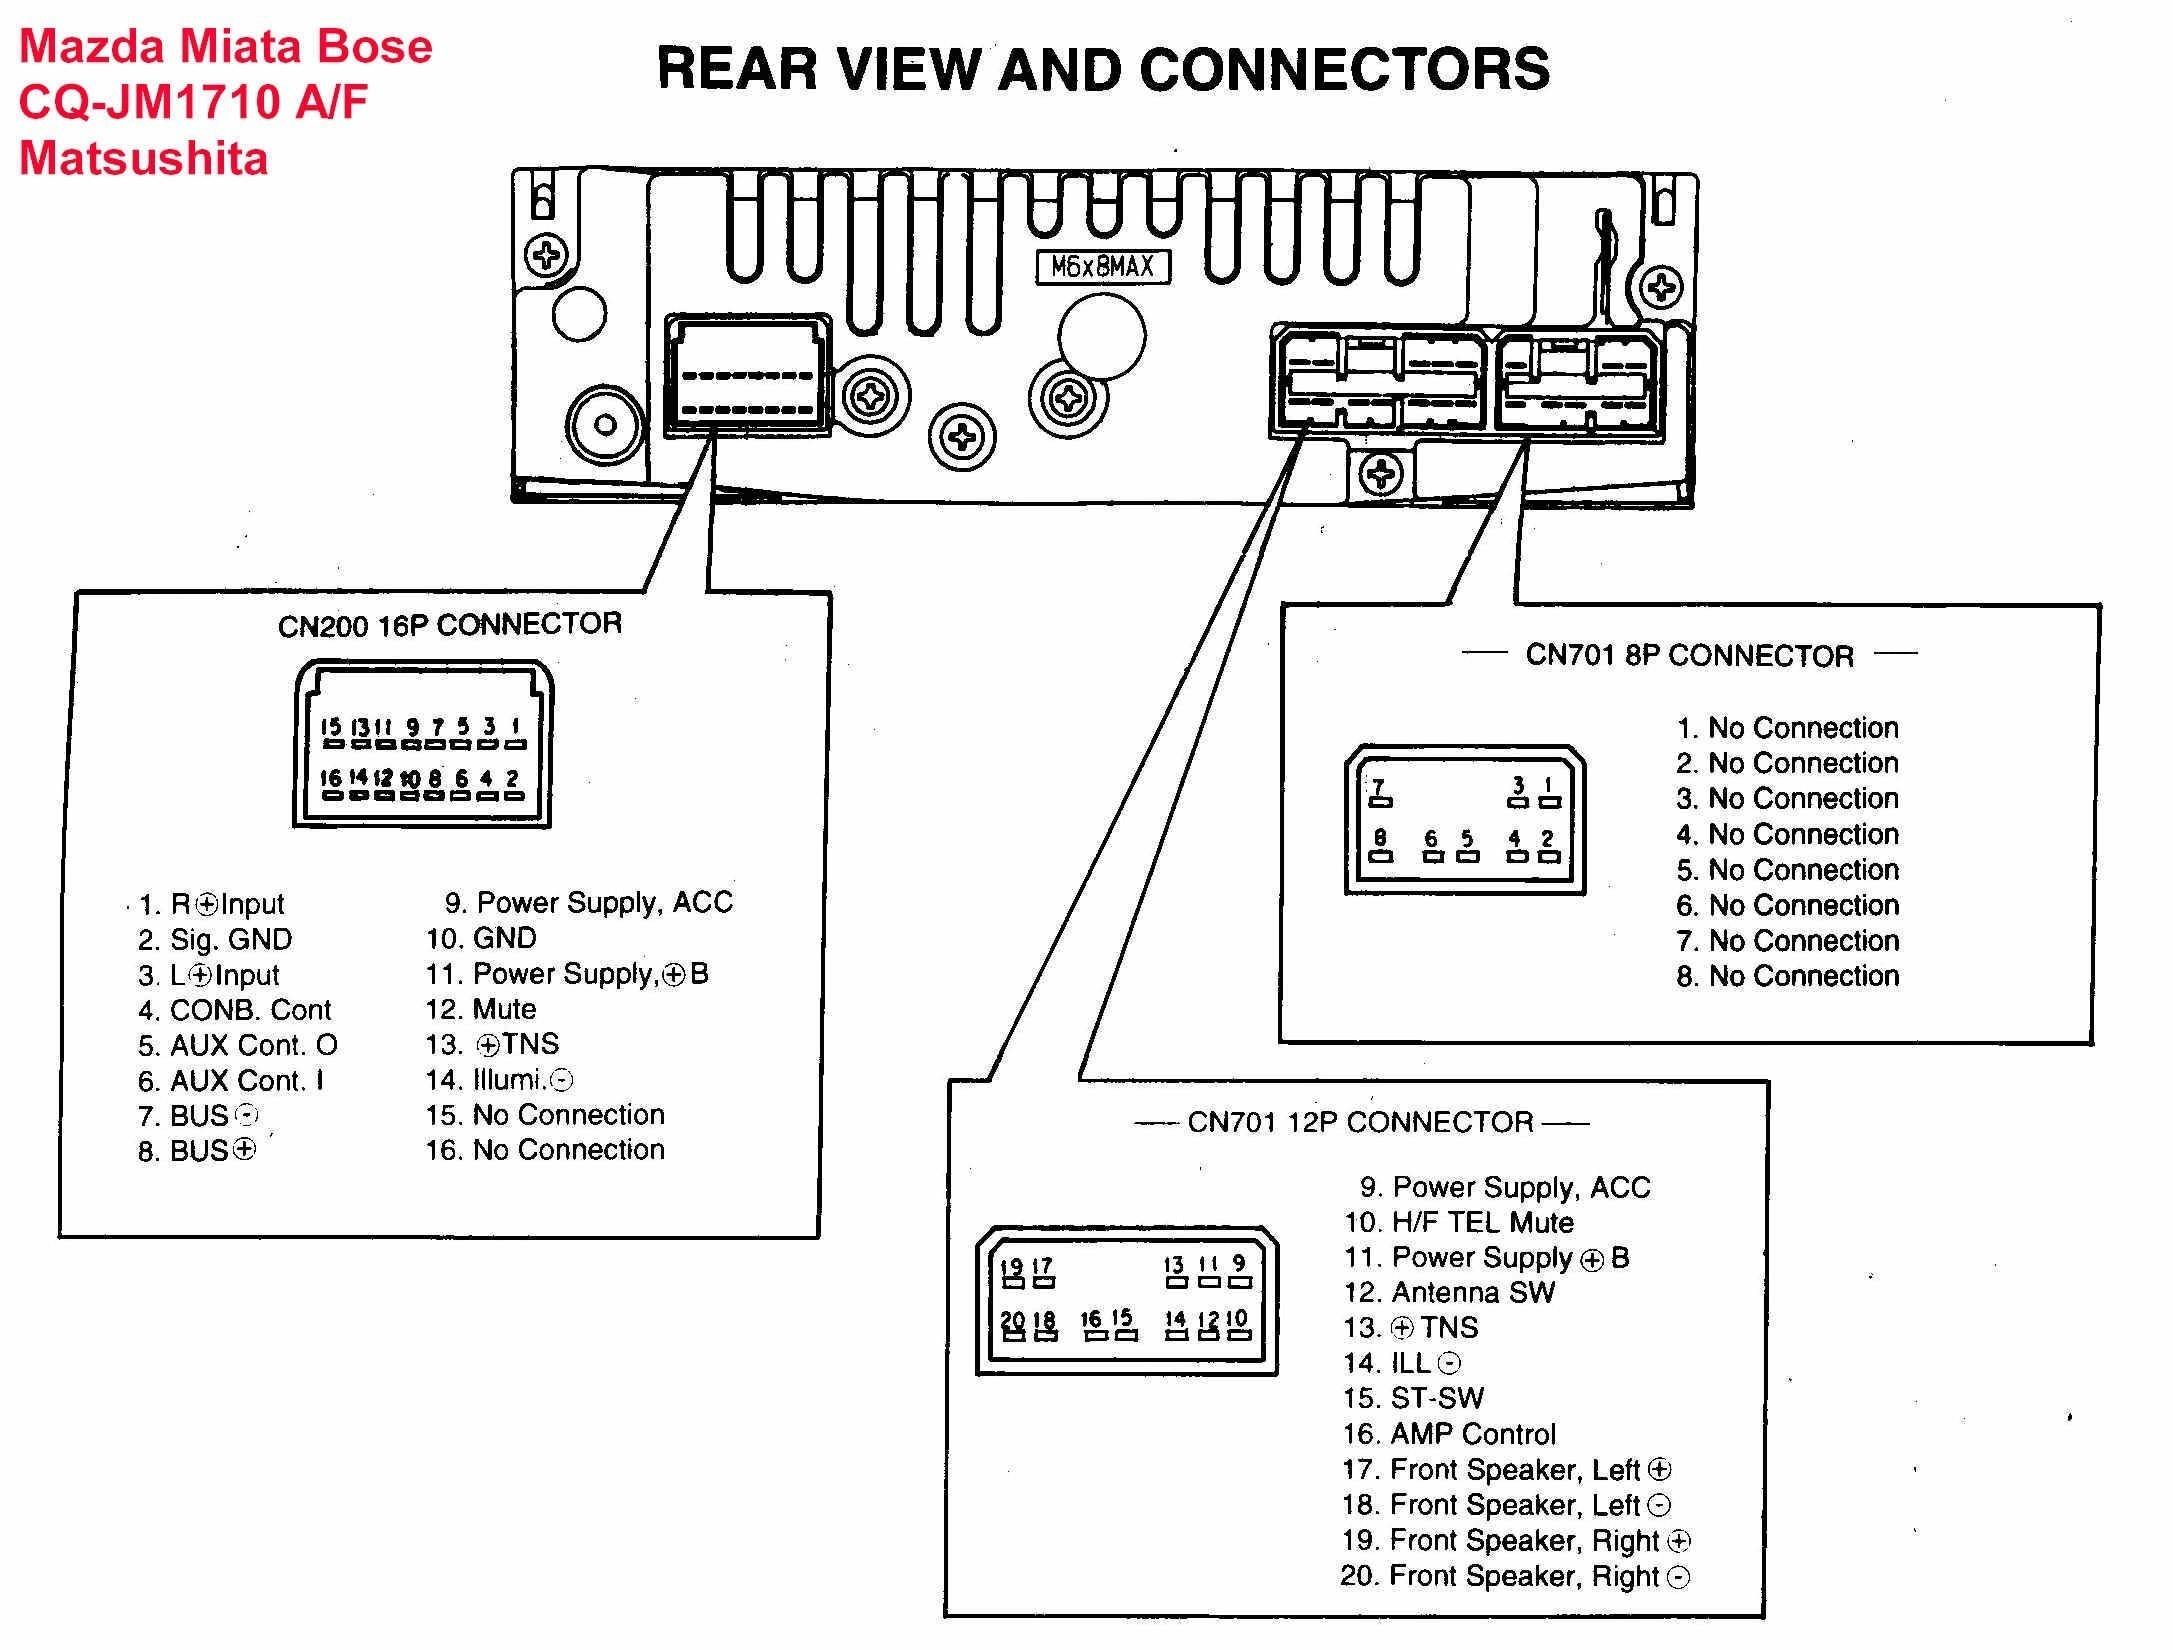 DIAGRAM] Bmw E15 Wiring Diagrams FULL Version HD Quality Wiring Diagrams -  CARS2019REVIEW.K-DANSE.FRK-danse.fr